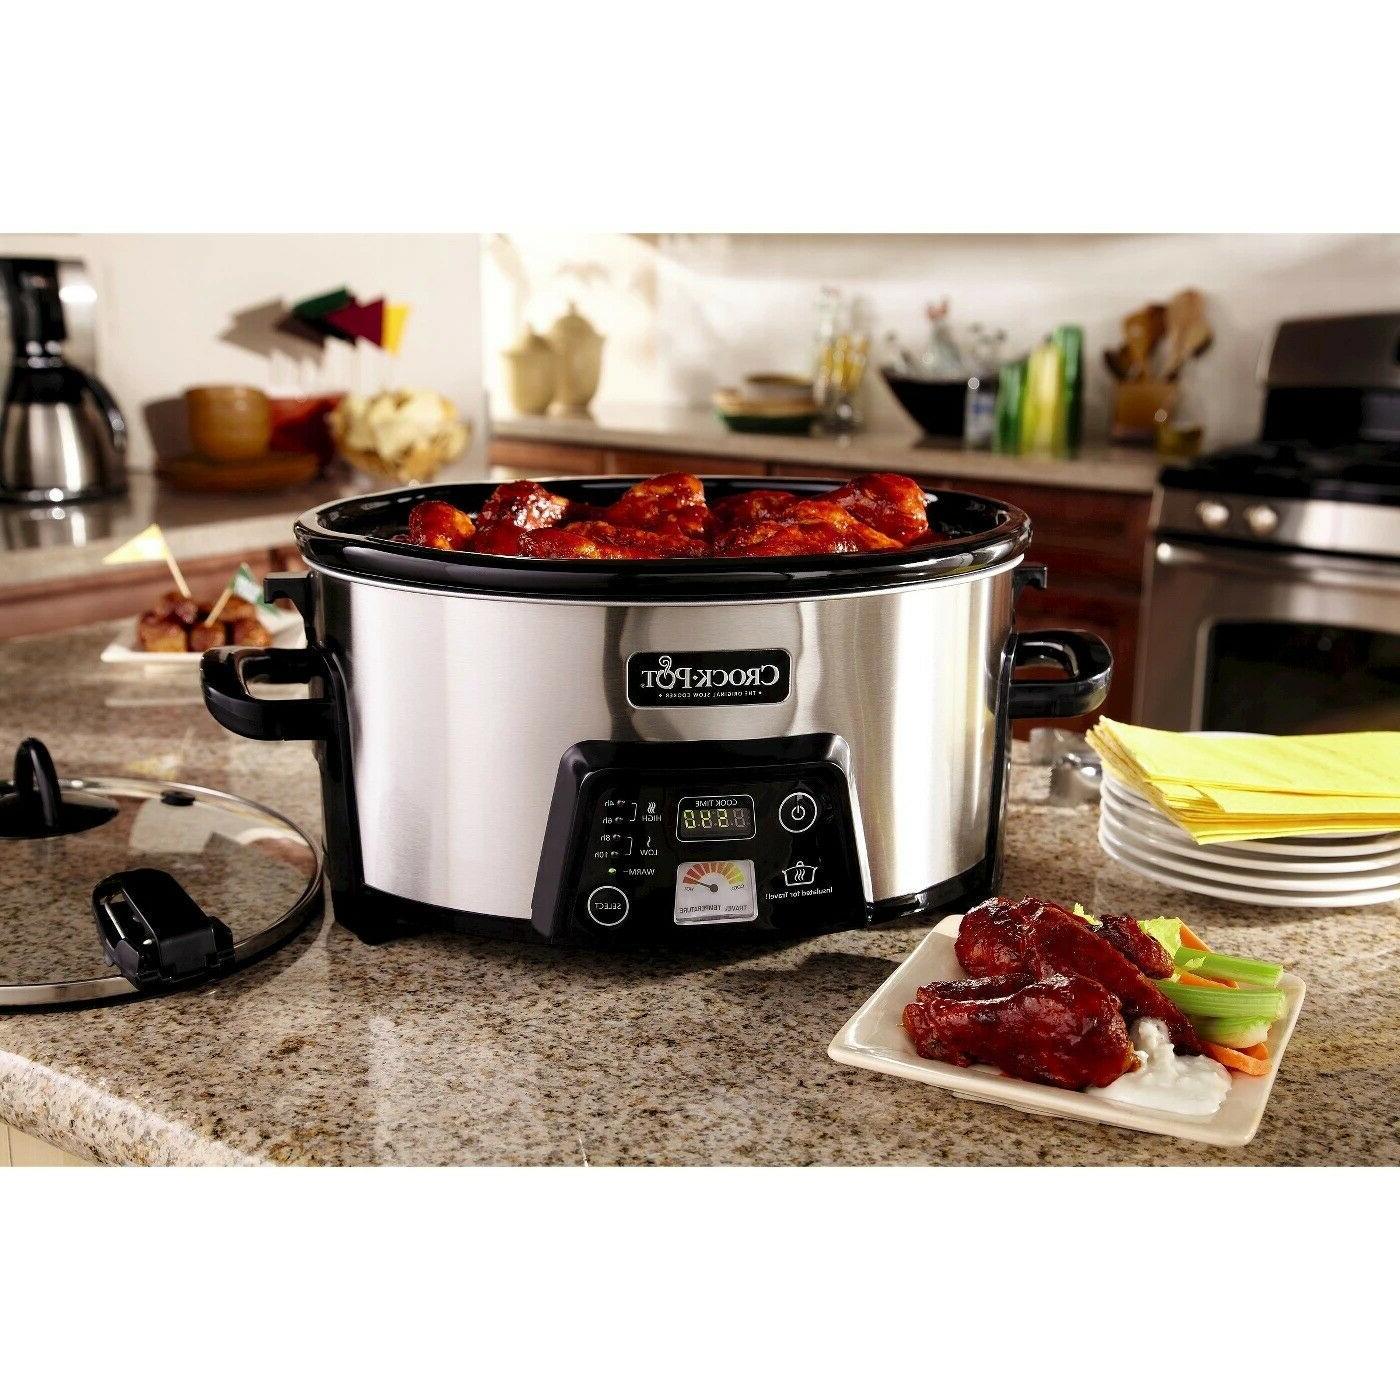 crock pot cook and carry digital slow